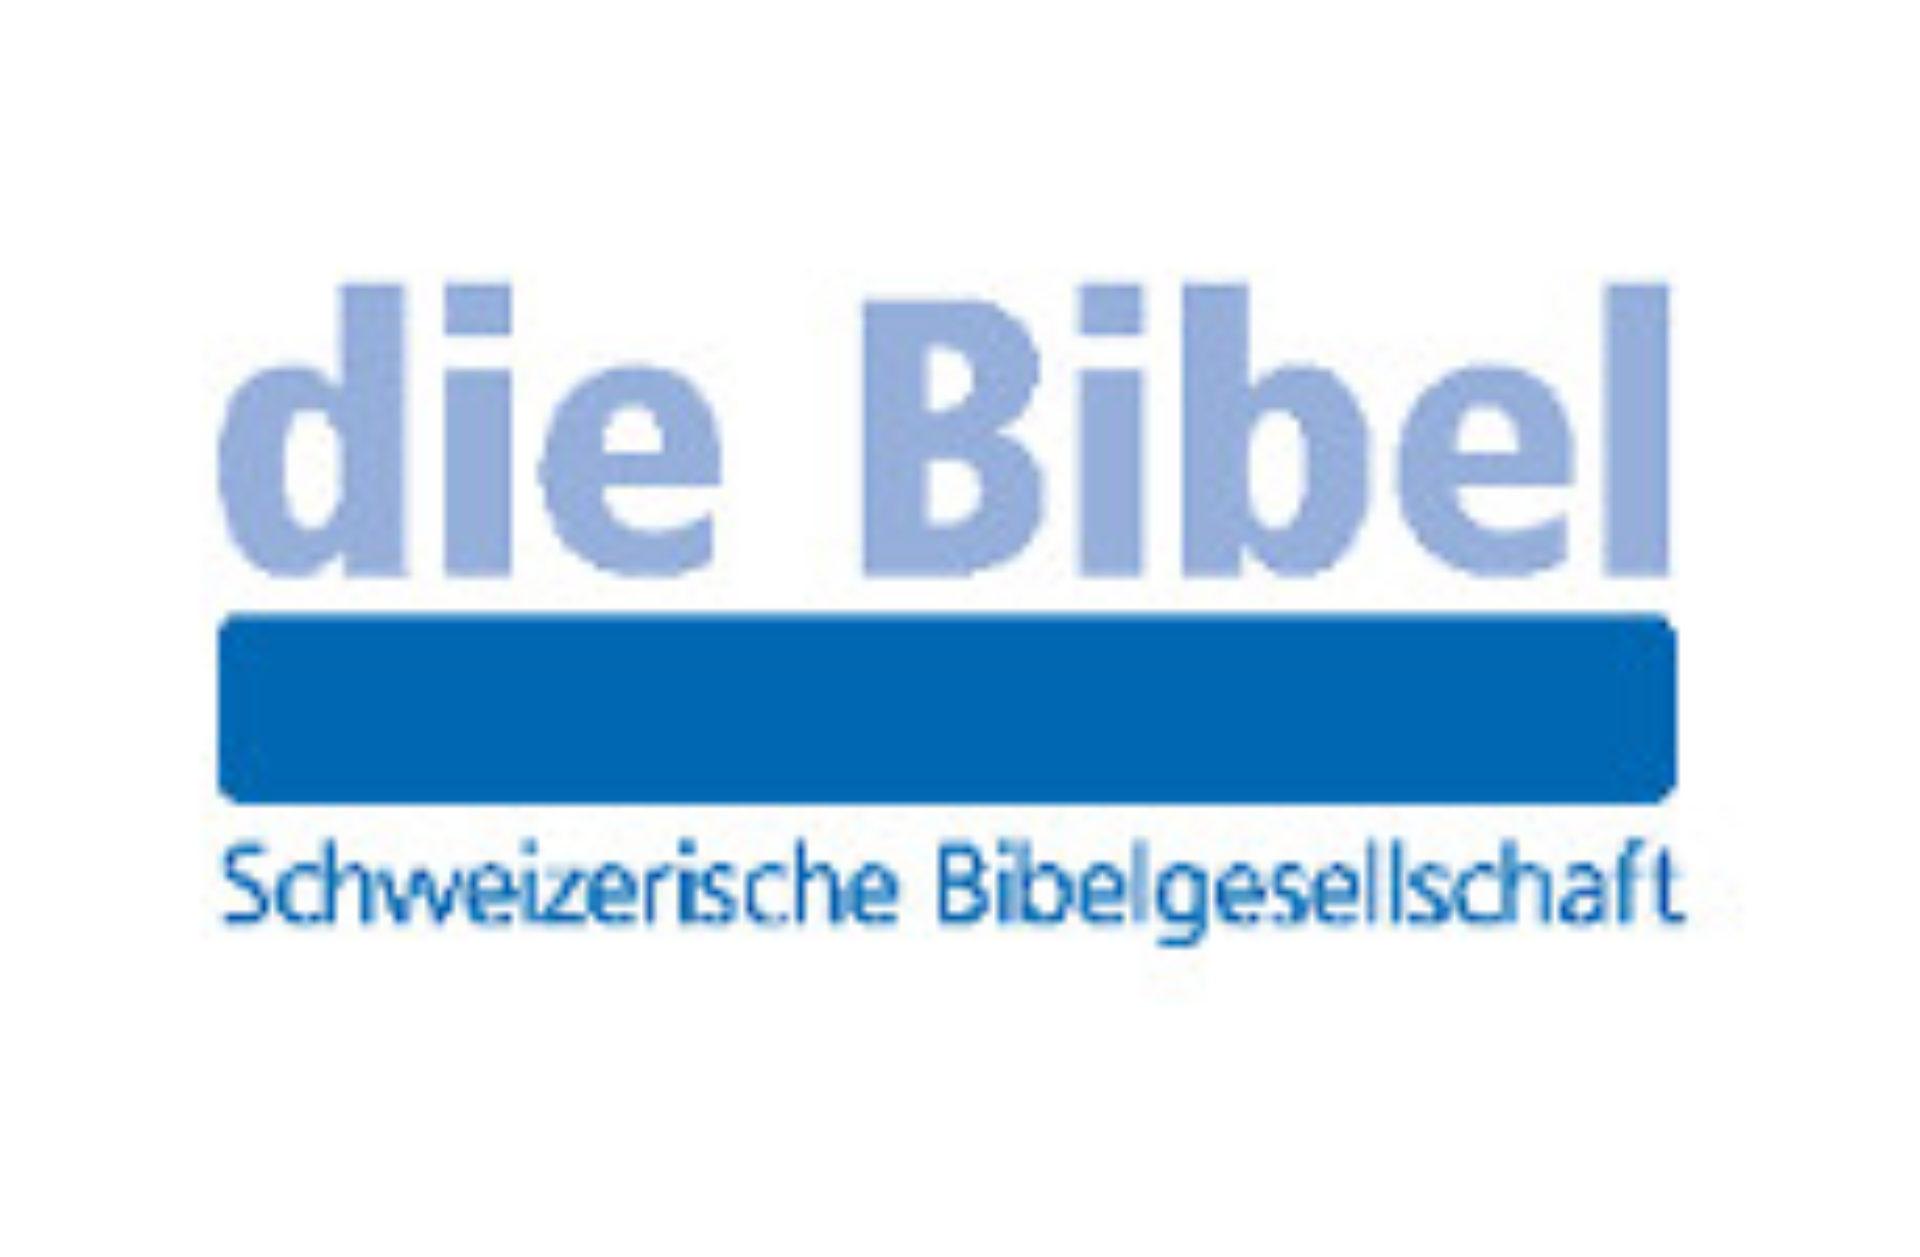 Schweizerische Bibelgesellschaft